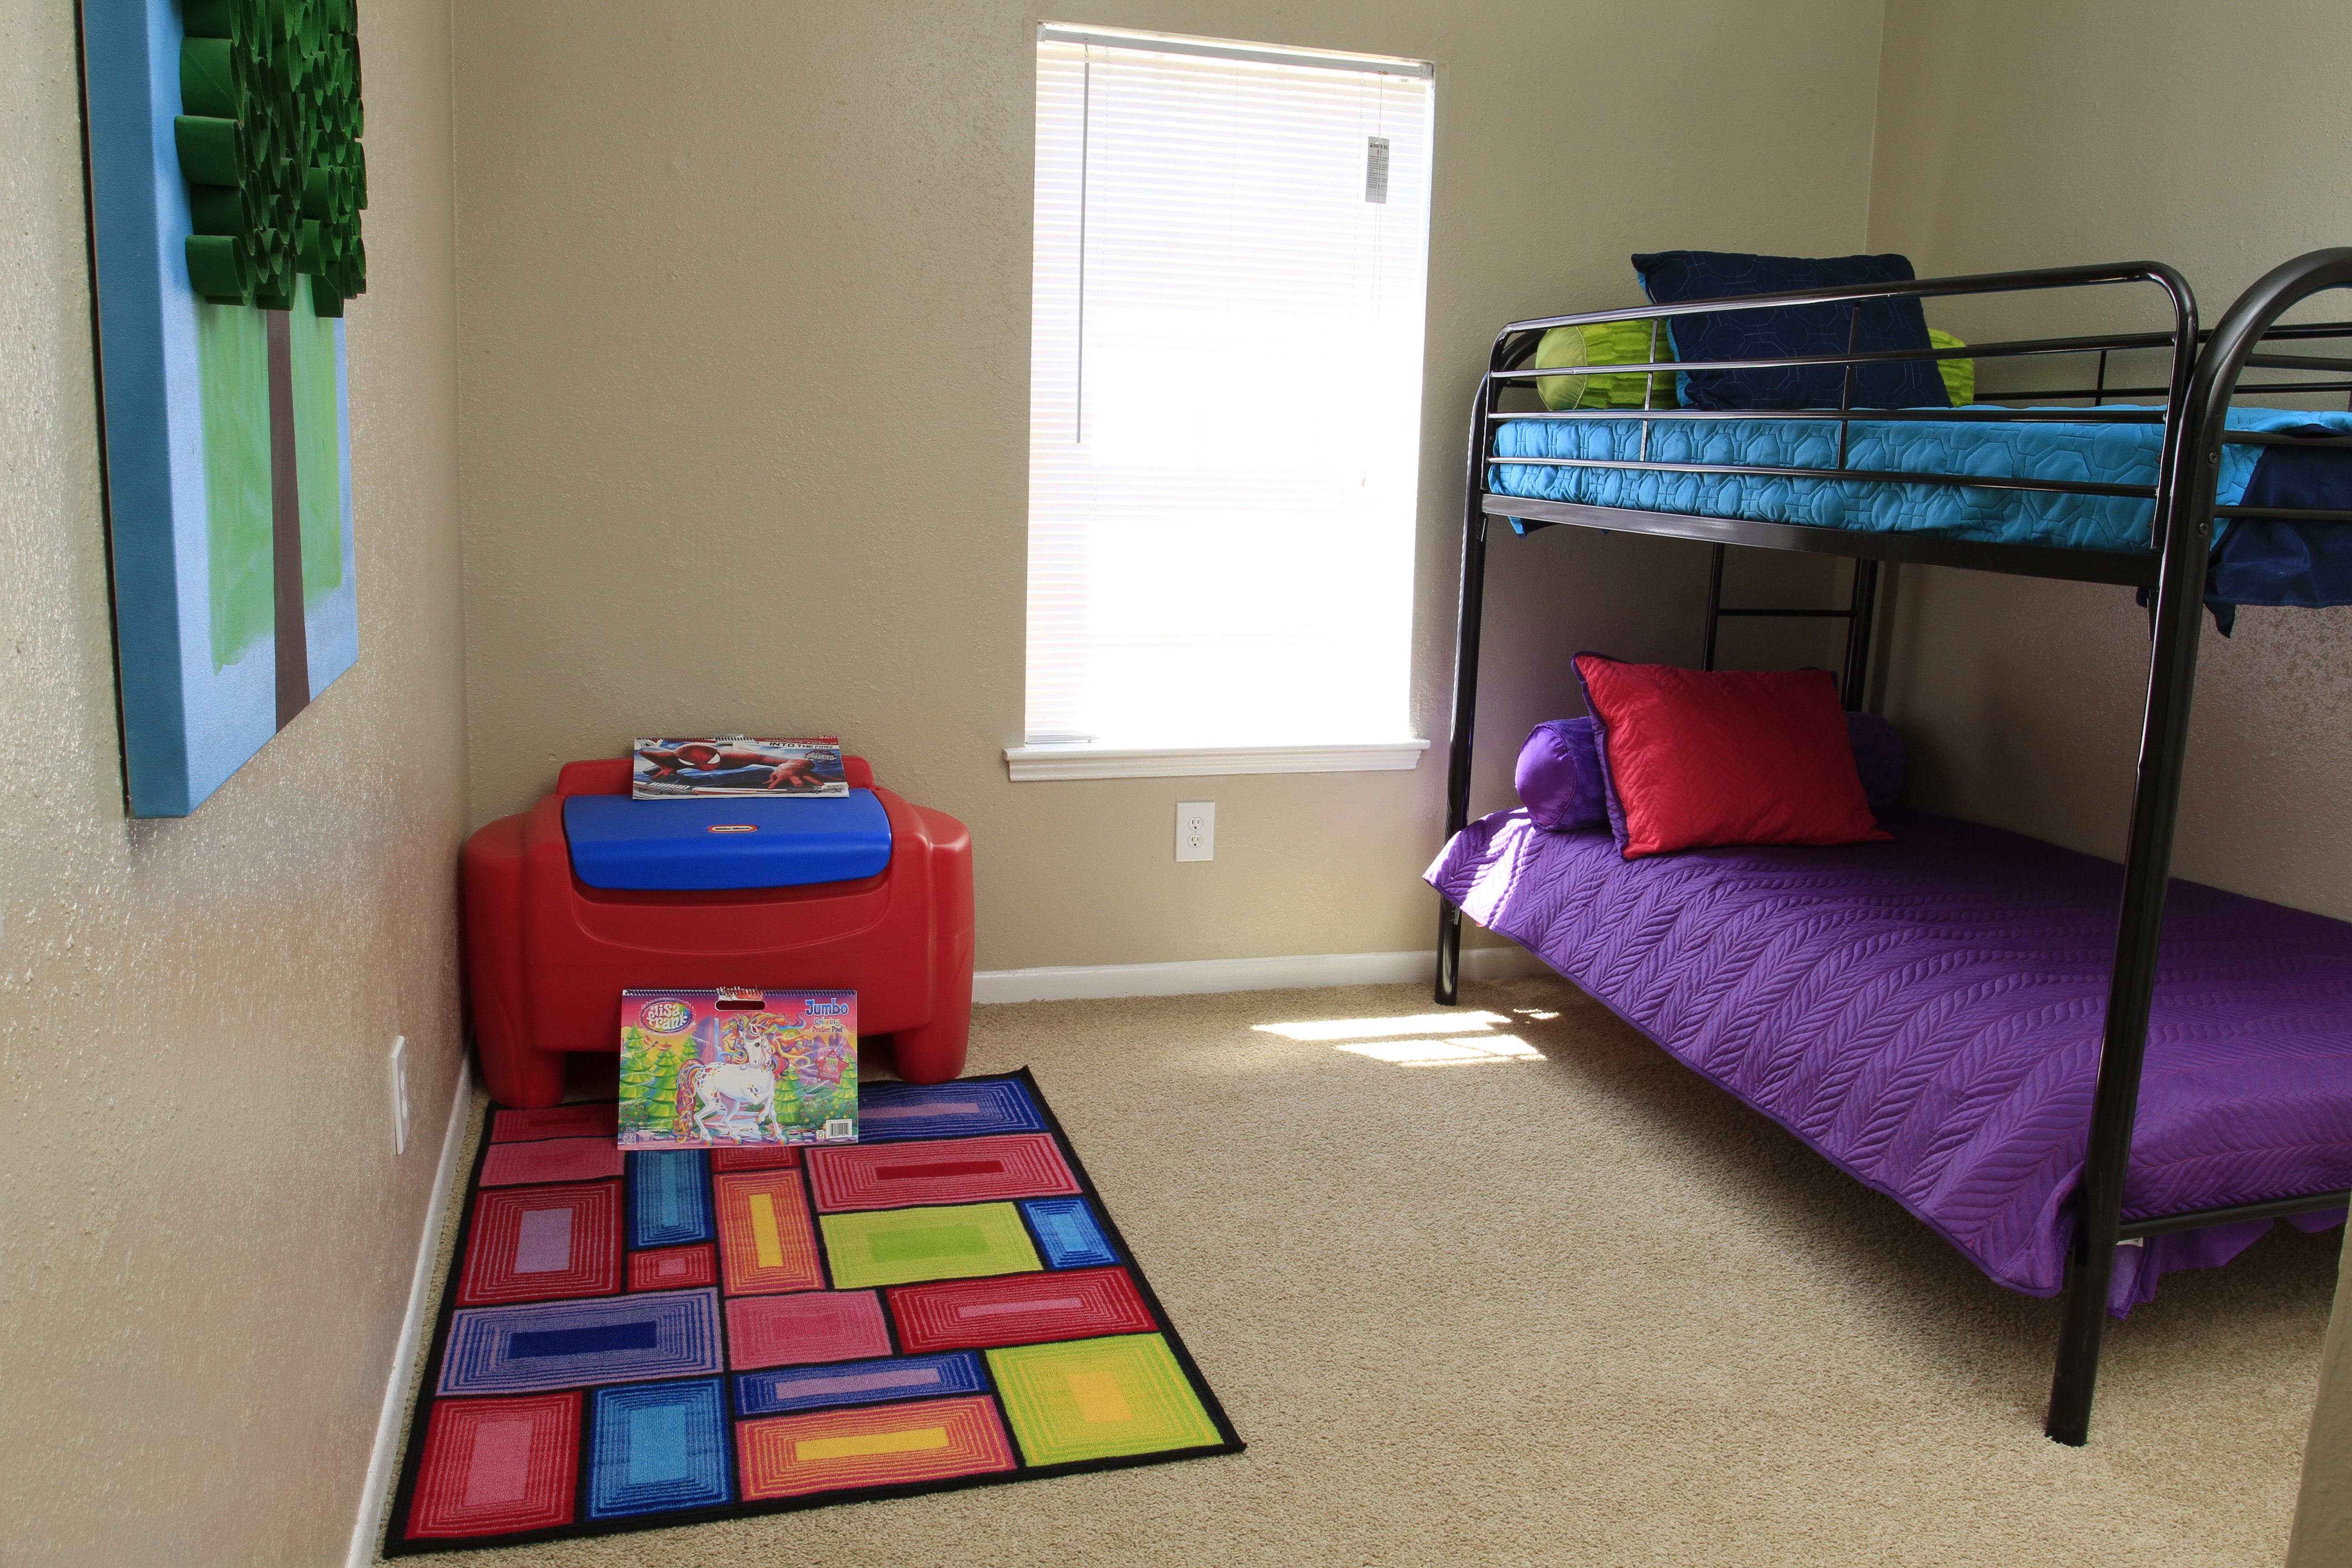 4 bedroom apartments pearland texas - 4 Bedroom Apartments Pearland Texas 22